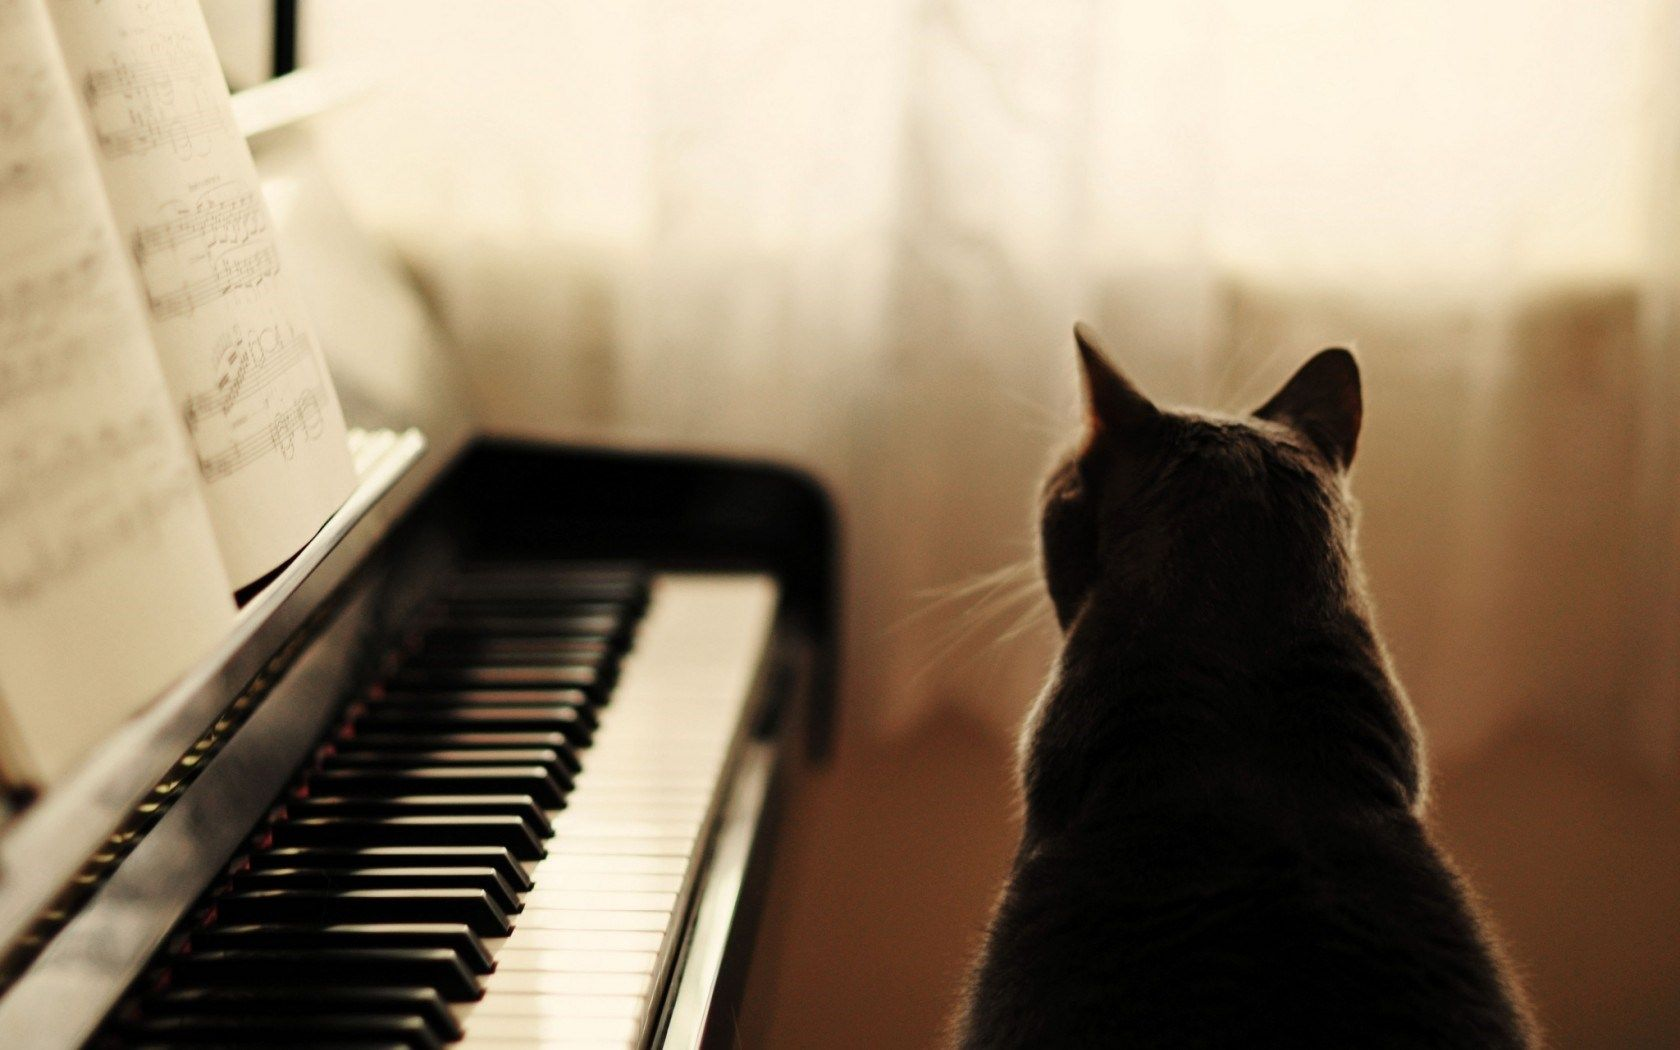 Piano Music Wallpapers Music Wallpaper Piano Piano Music